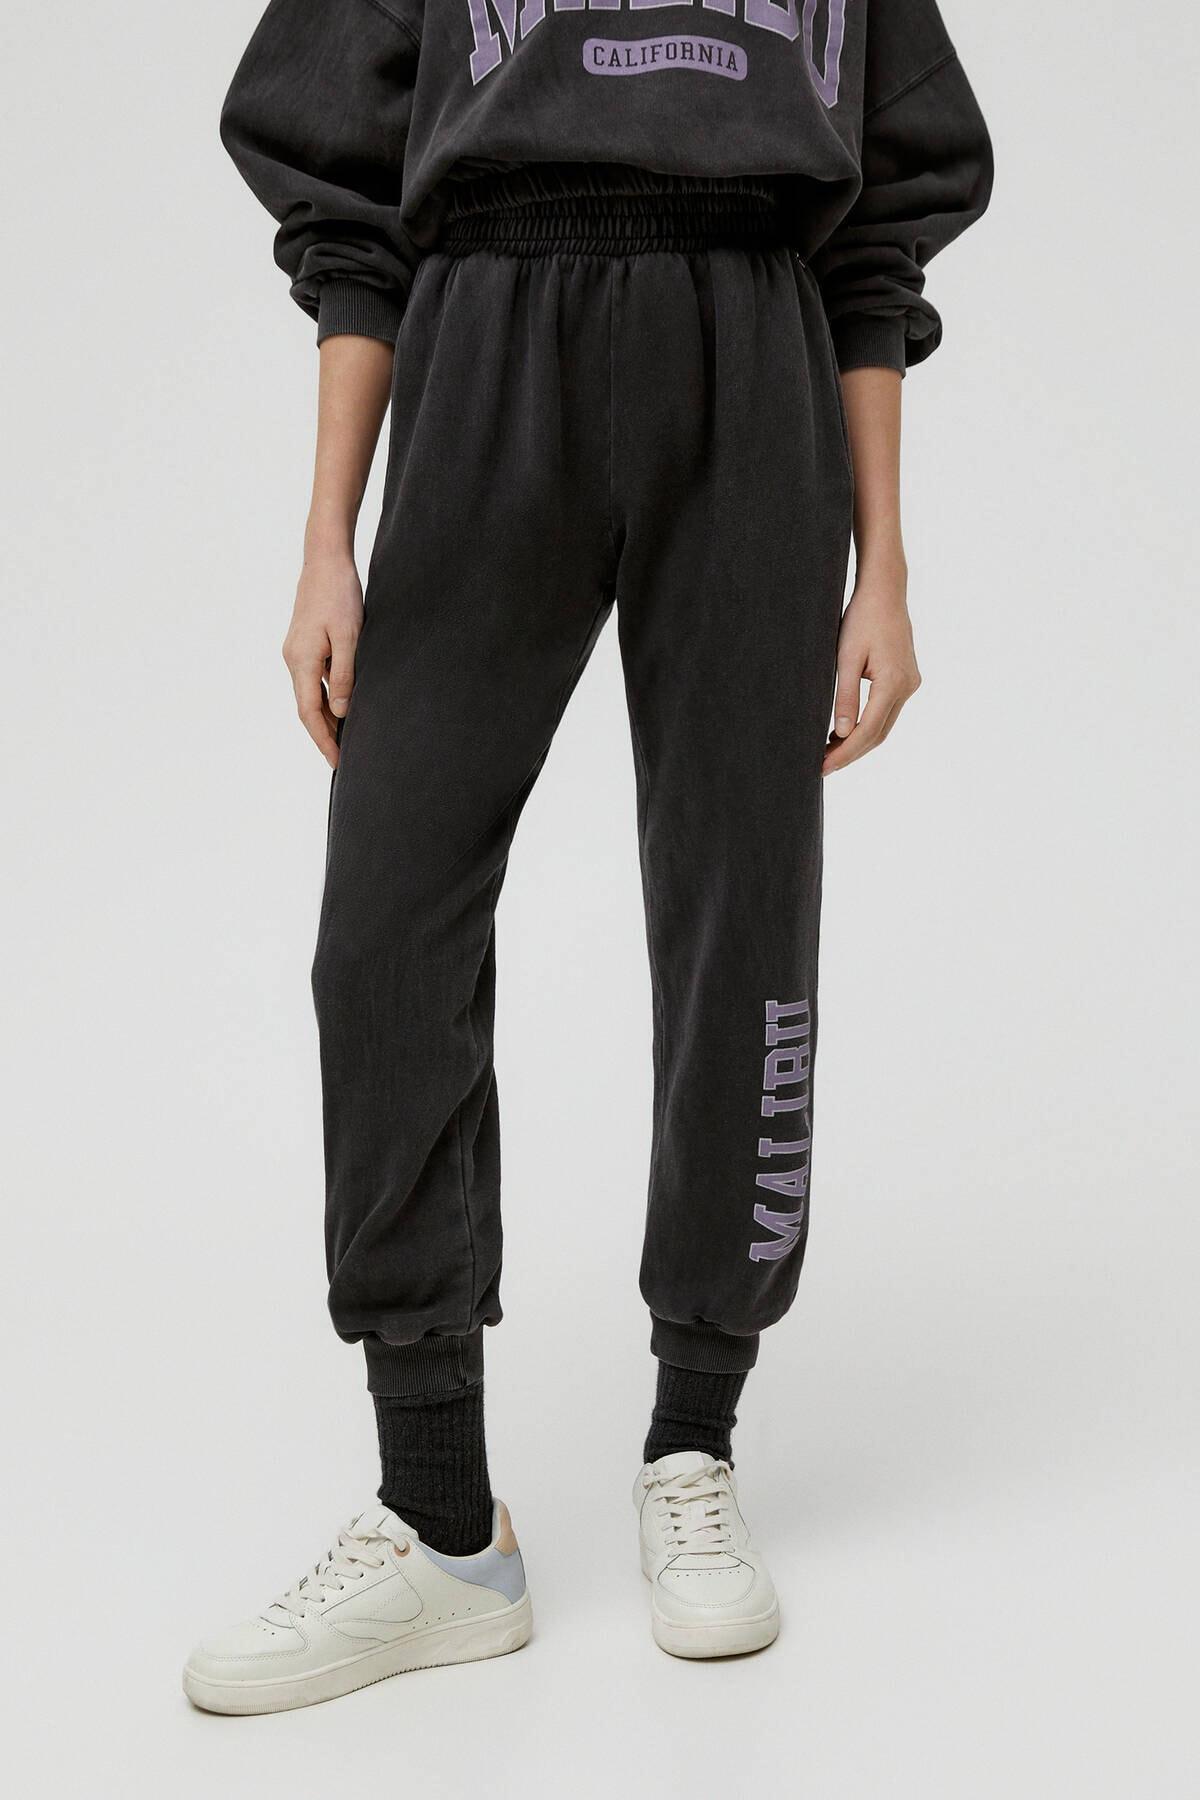 Pull & Bear Kadın Soluk Siyah Miami Sloganlı Jogging Fit Pantolon 04677303 1